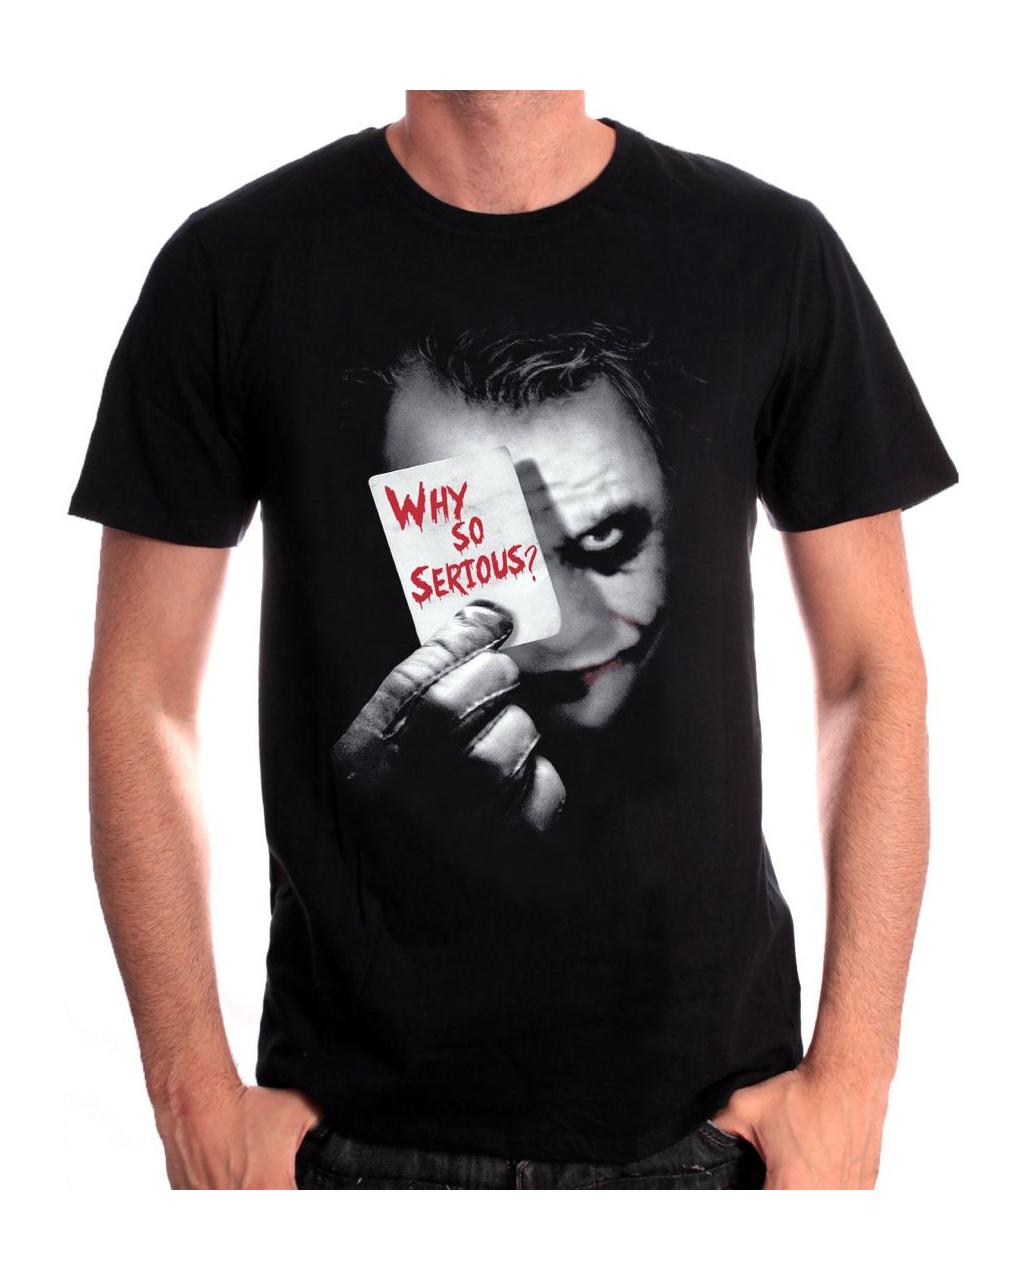 batman t shirt Sale,up to 70% Discounts